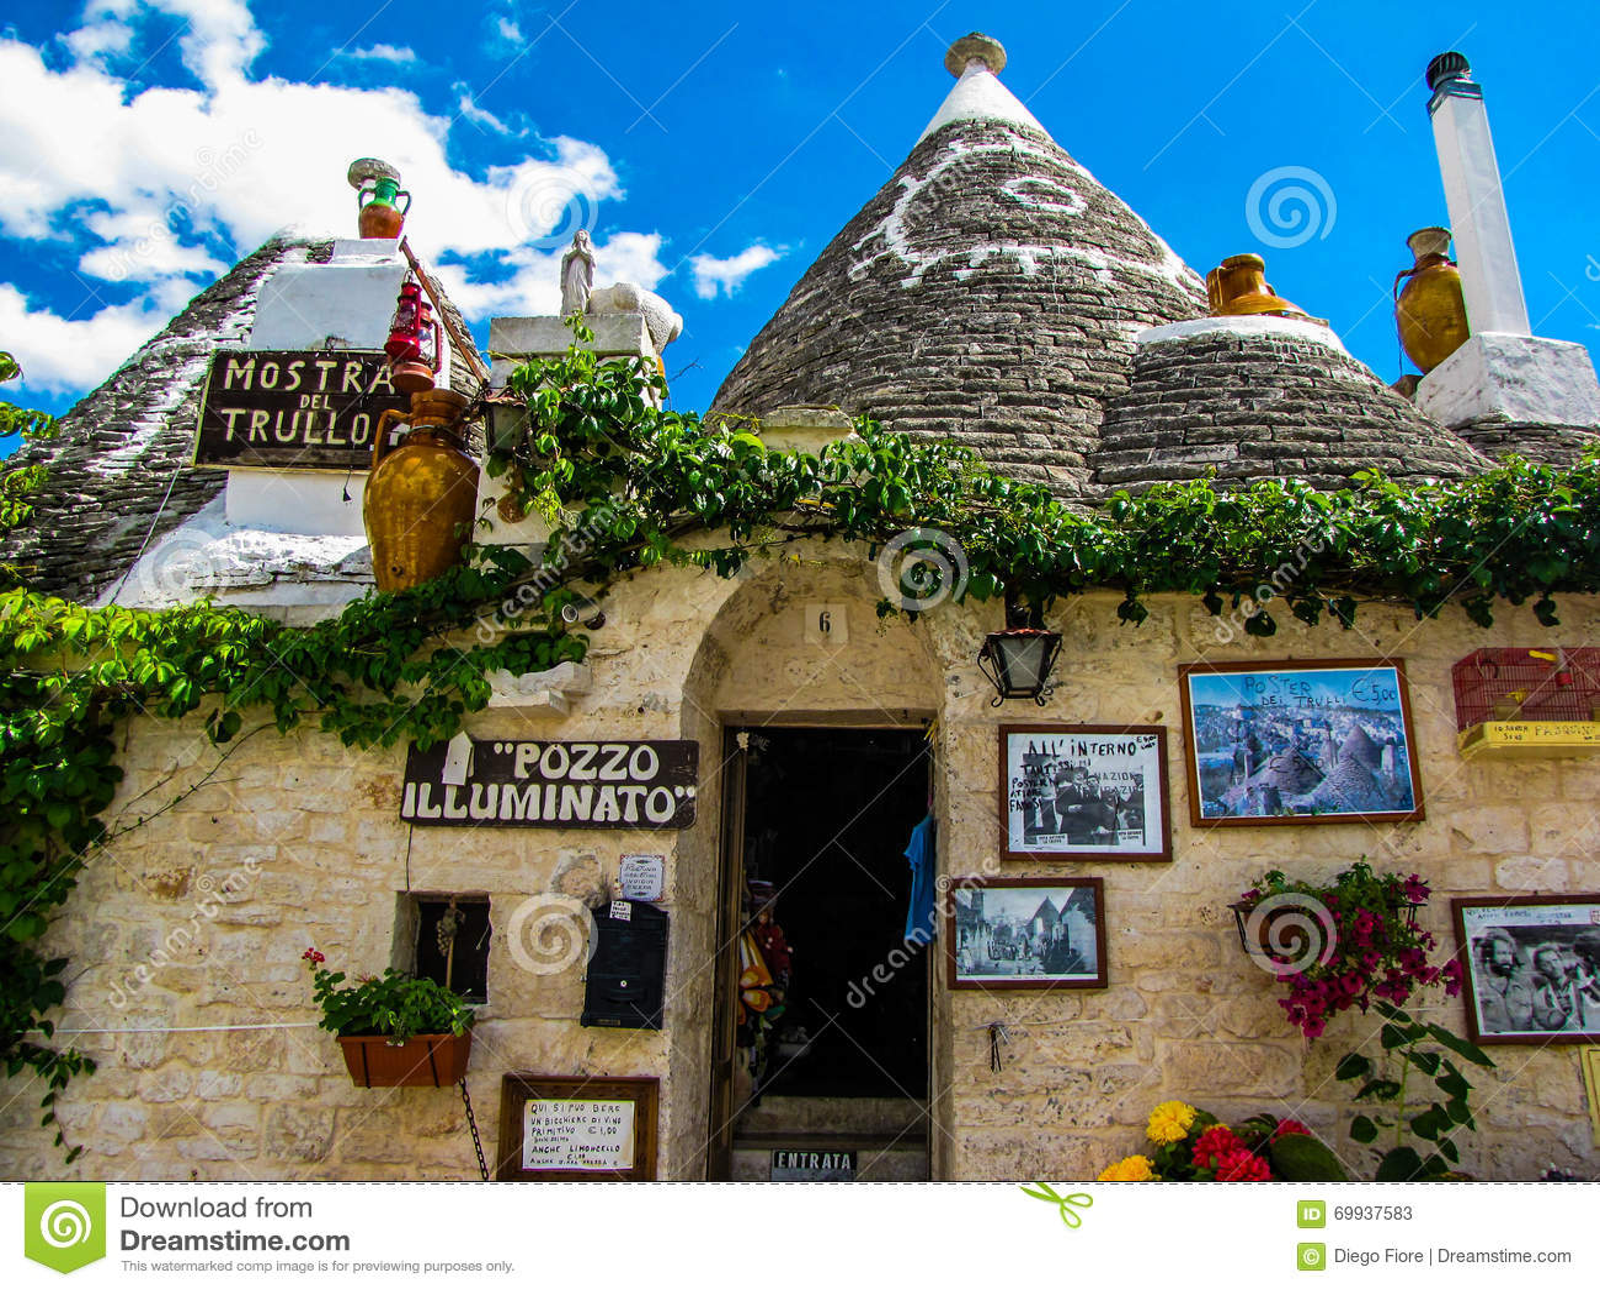 Merkwürdige Häuser In Alberobello, Italien Stockbild - Bild von ...